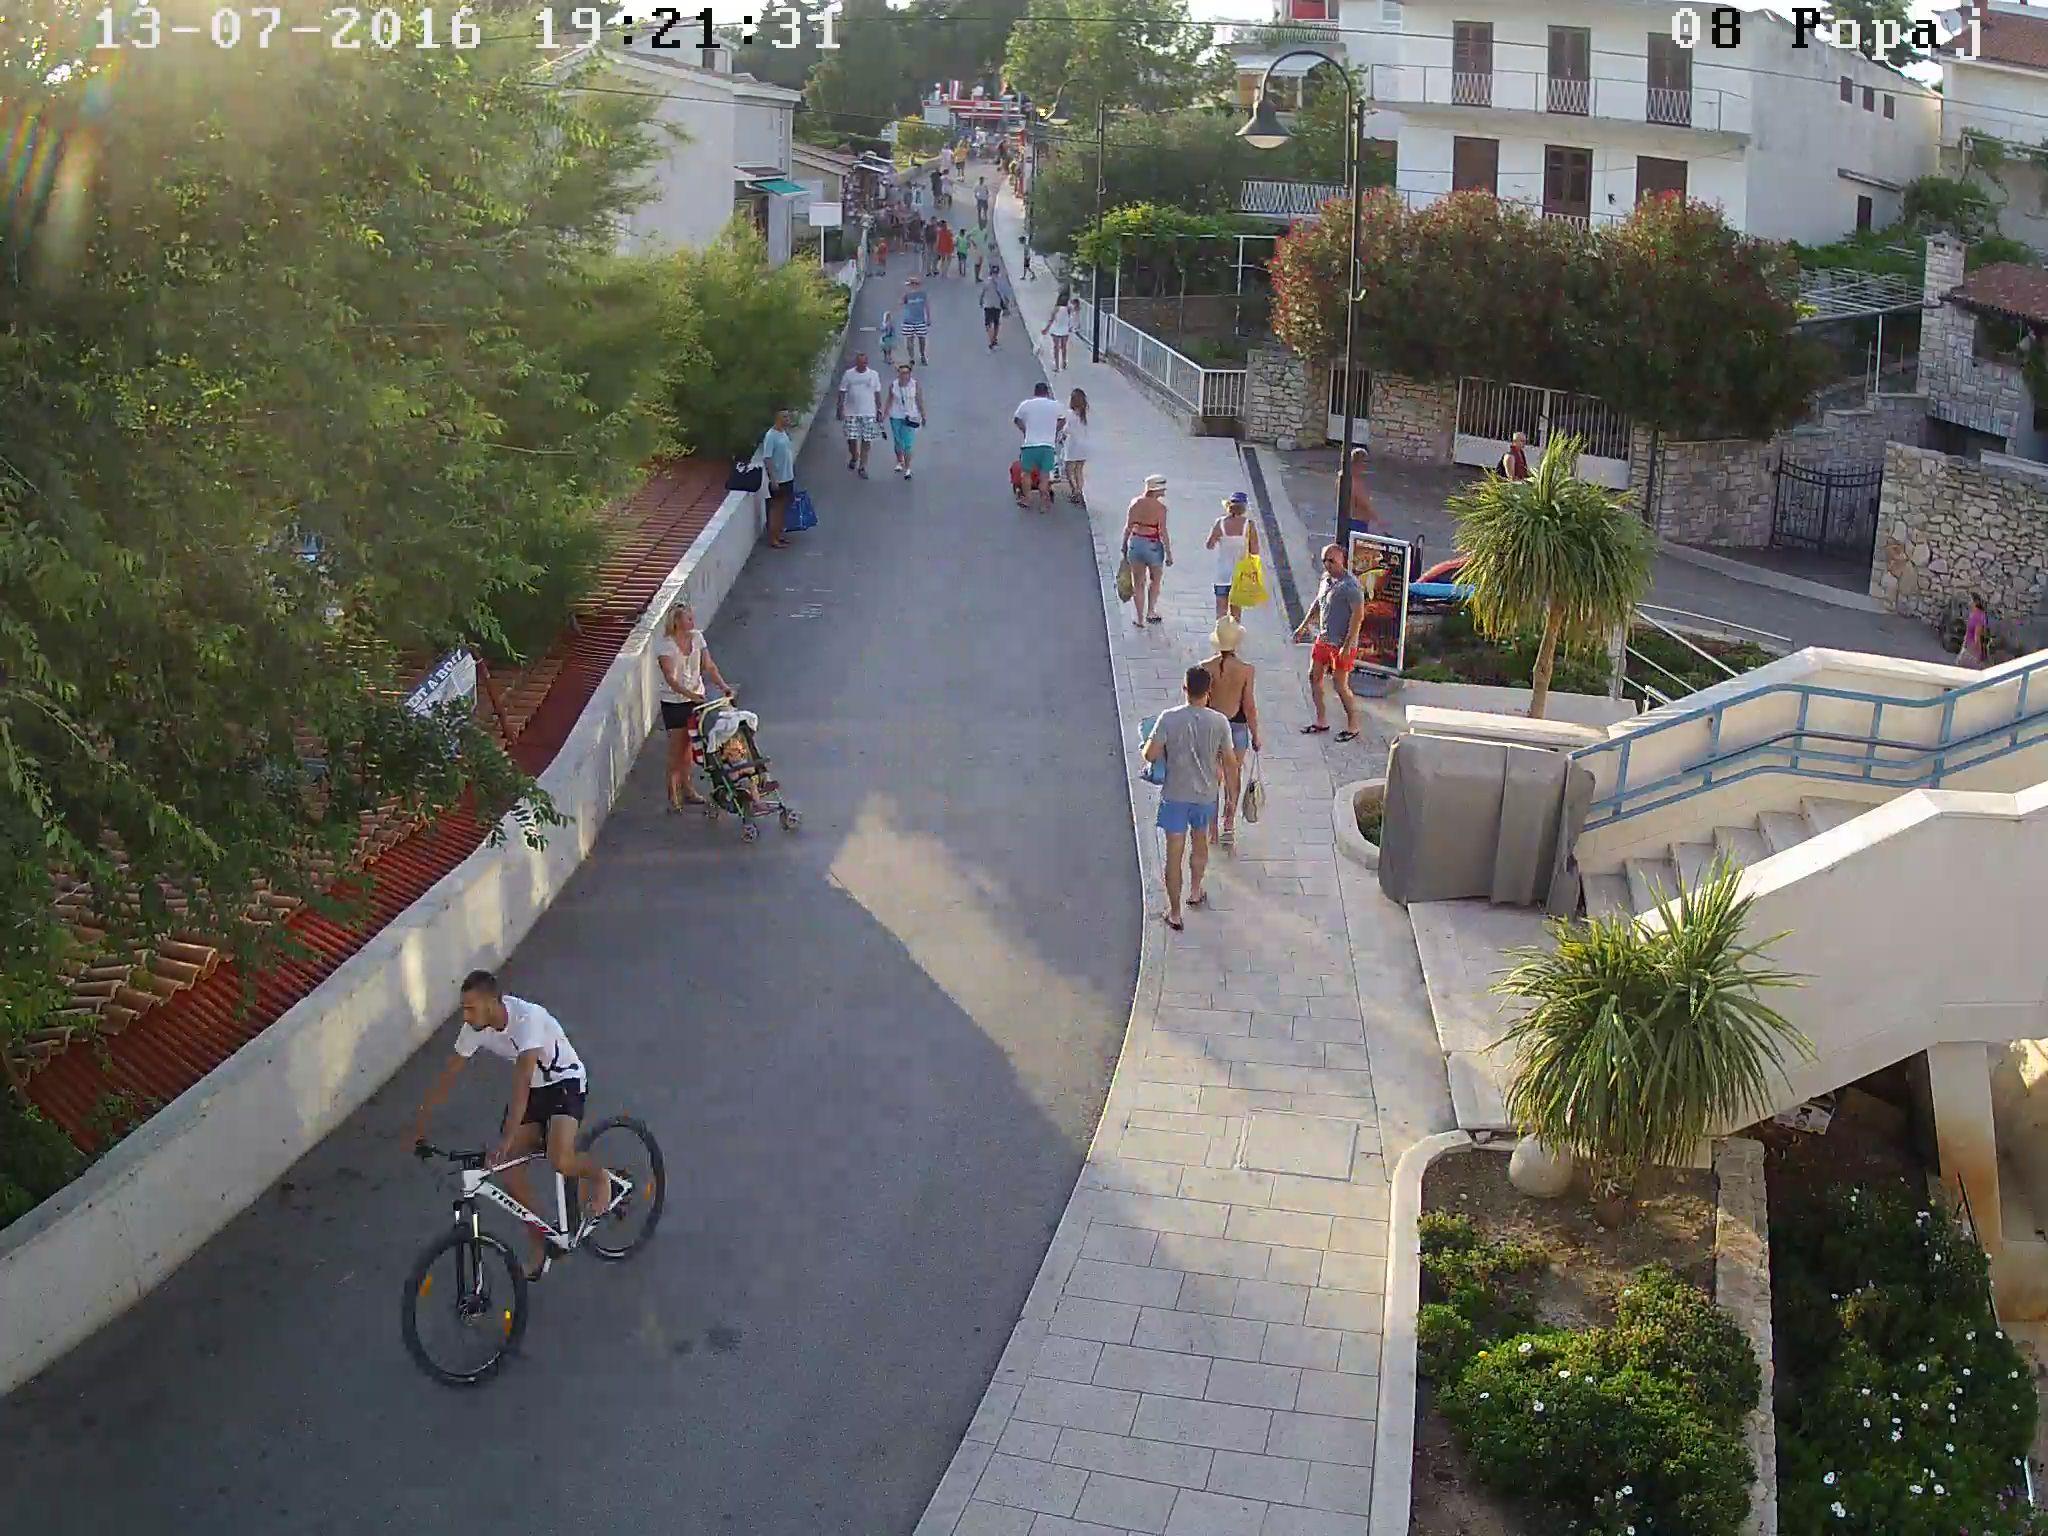 Krađa bicikla (6)